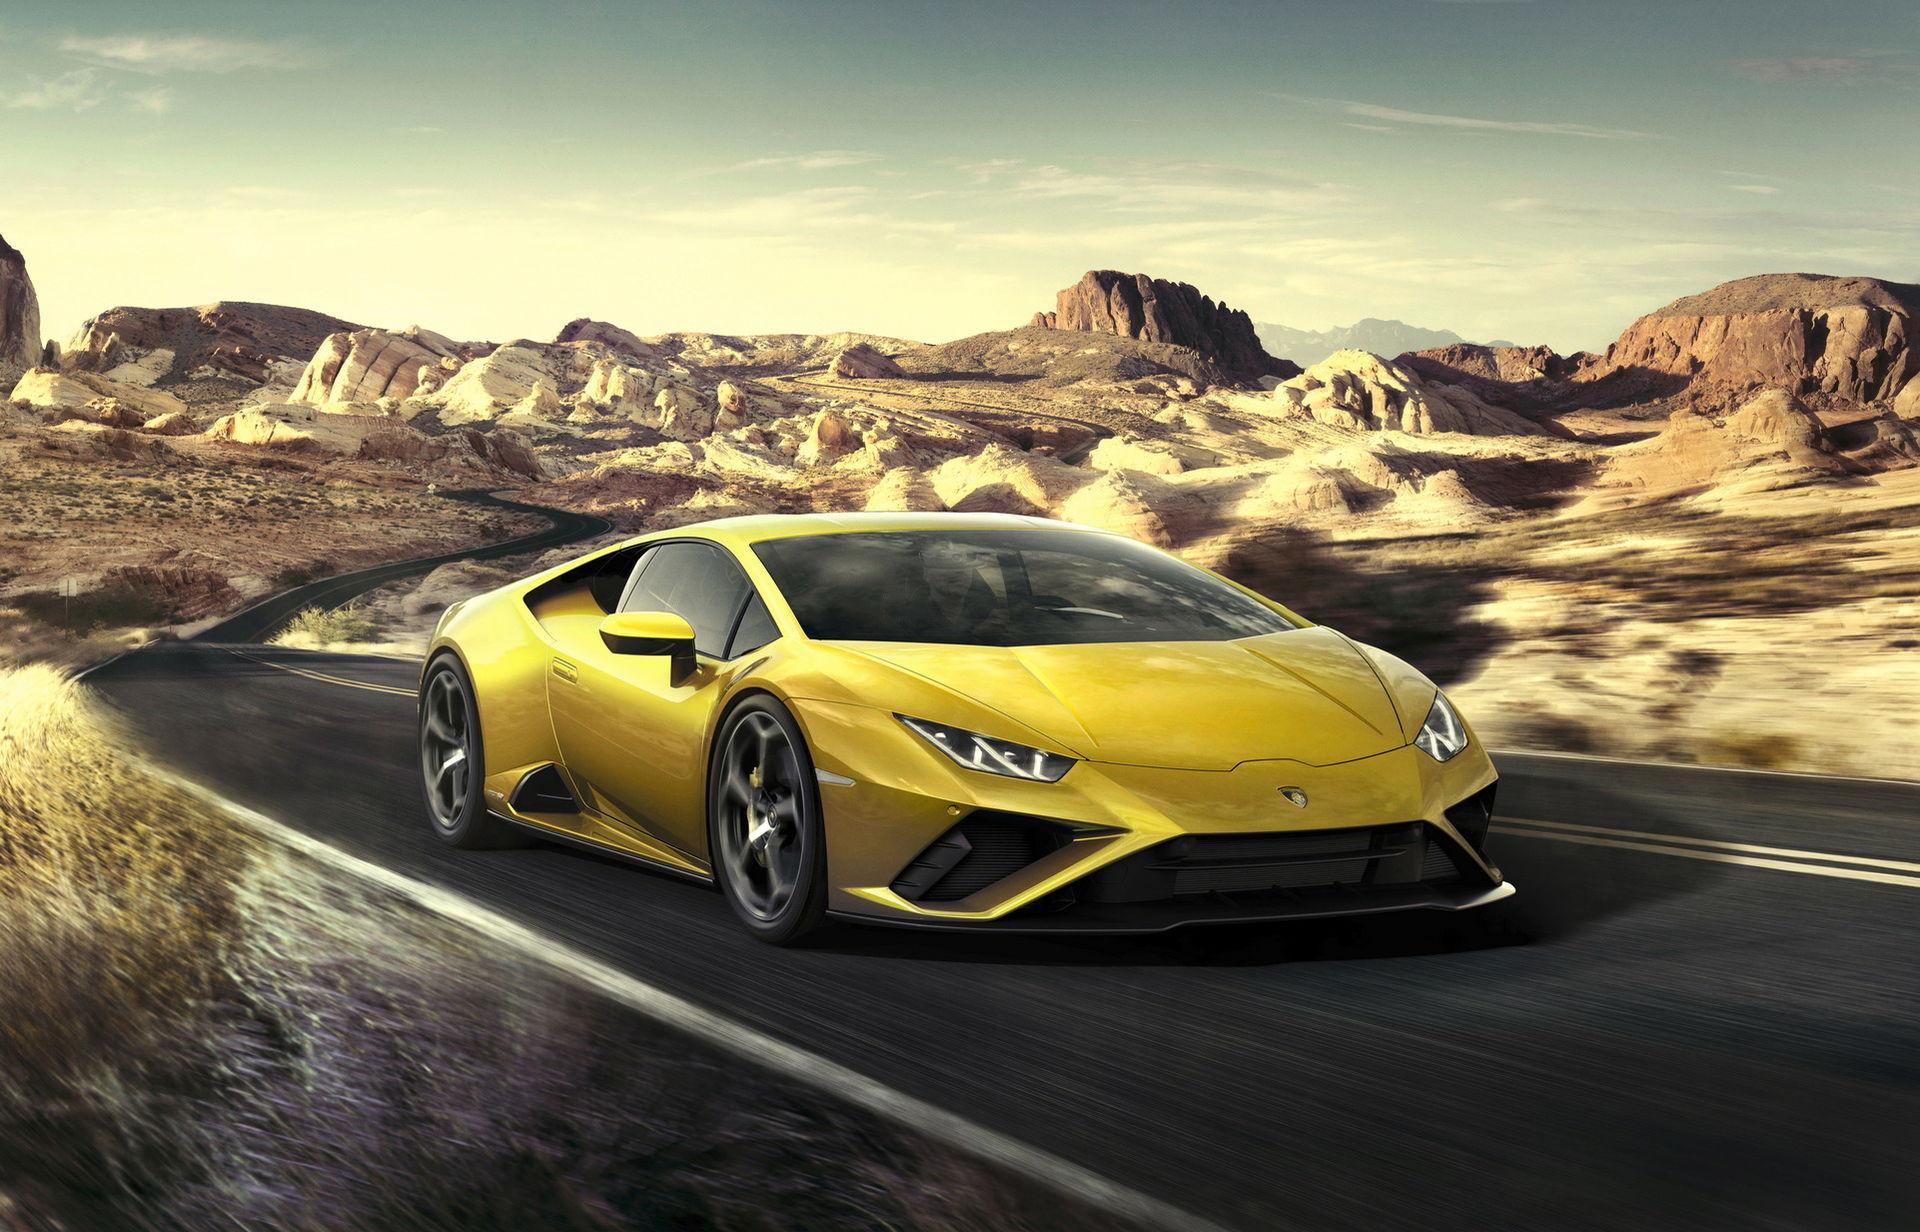 Lamborghini Huracán Evo nu med endast bakhjulsdrift